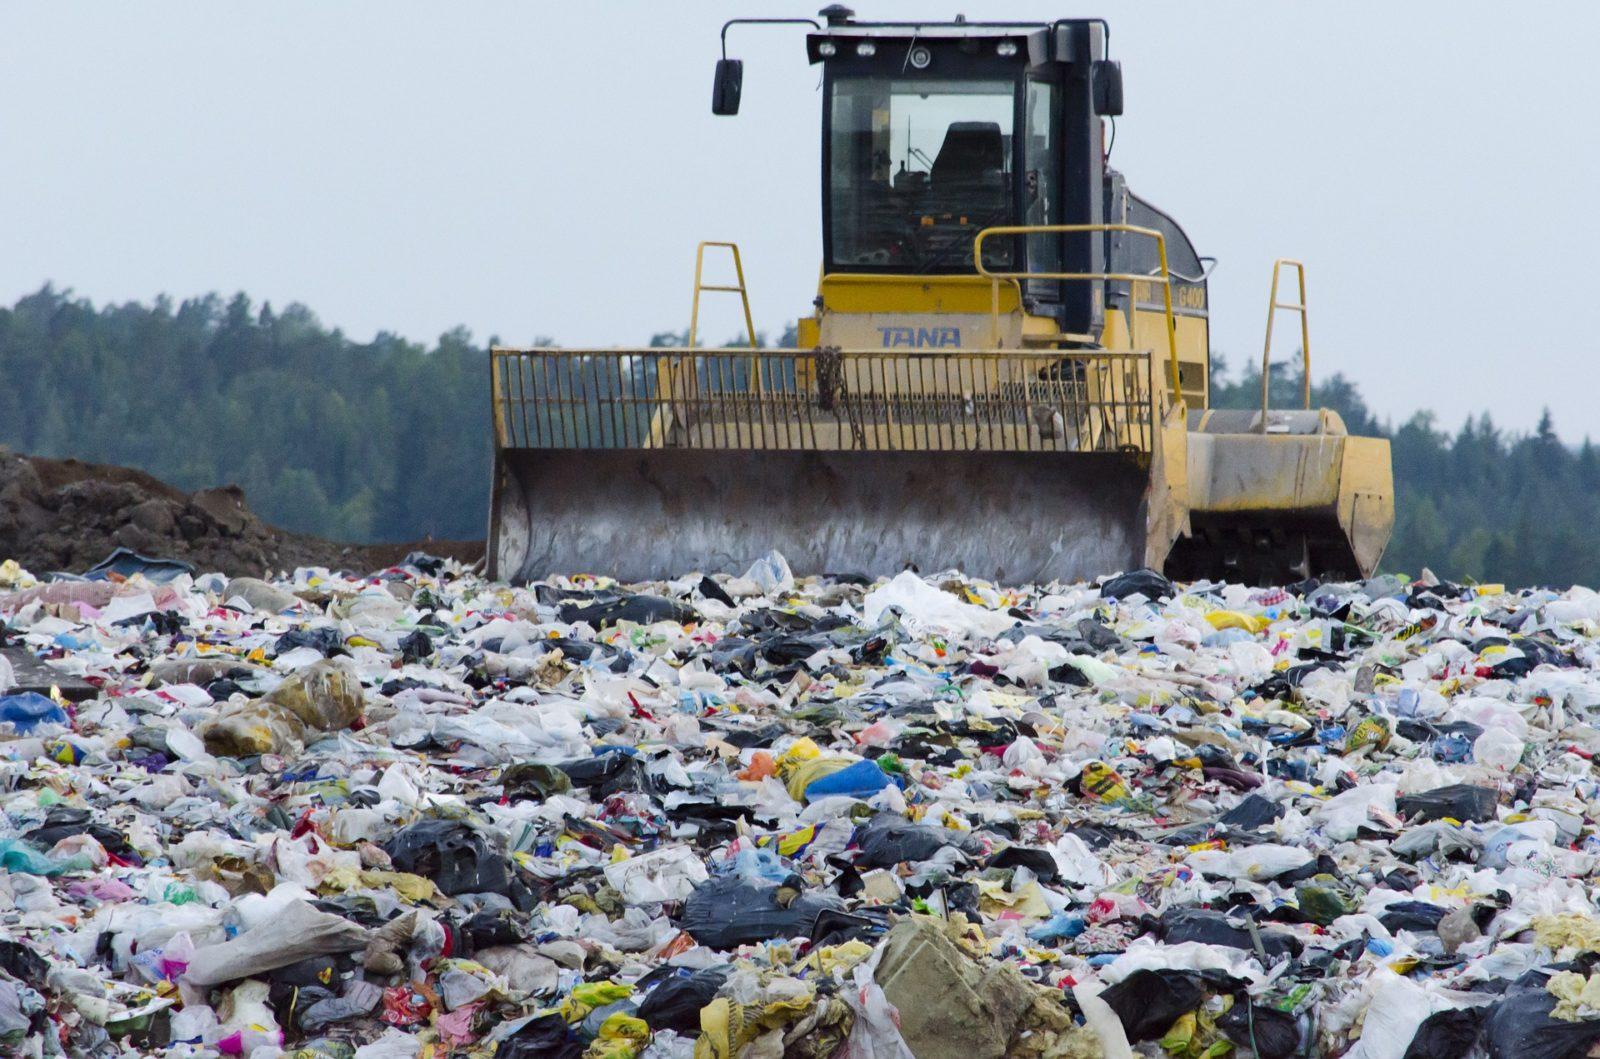 Synod waste management company